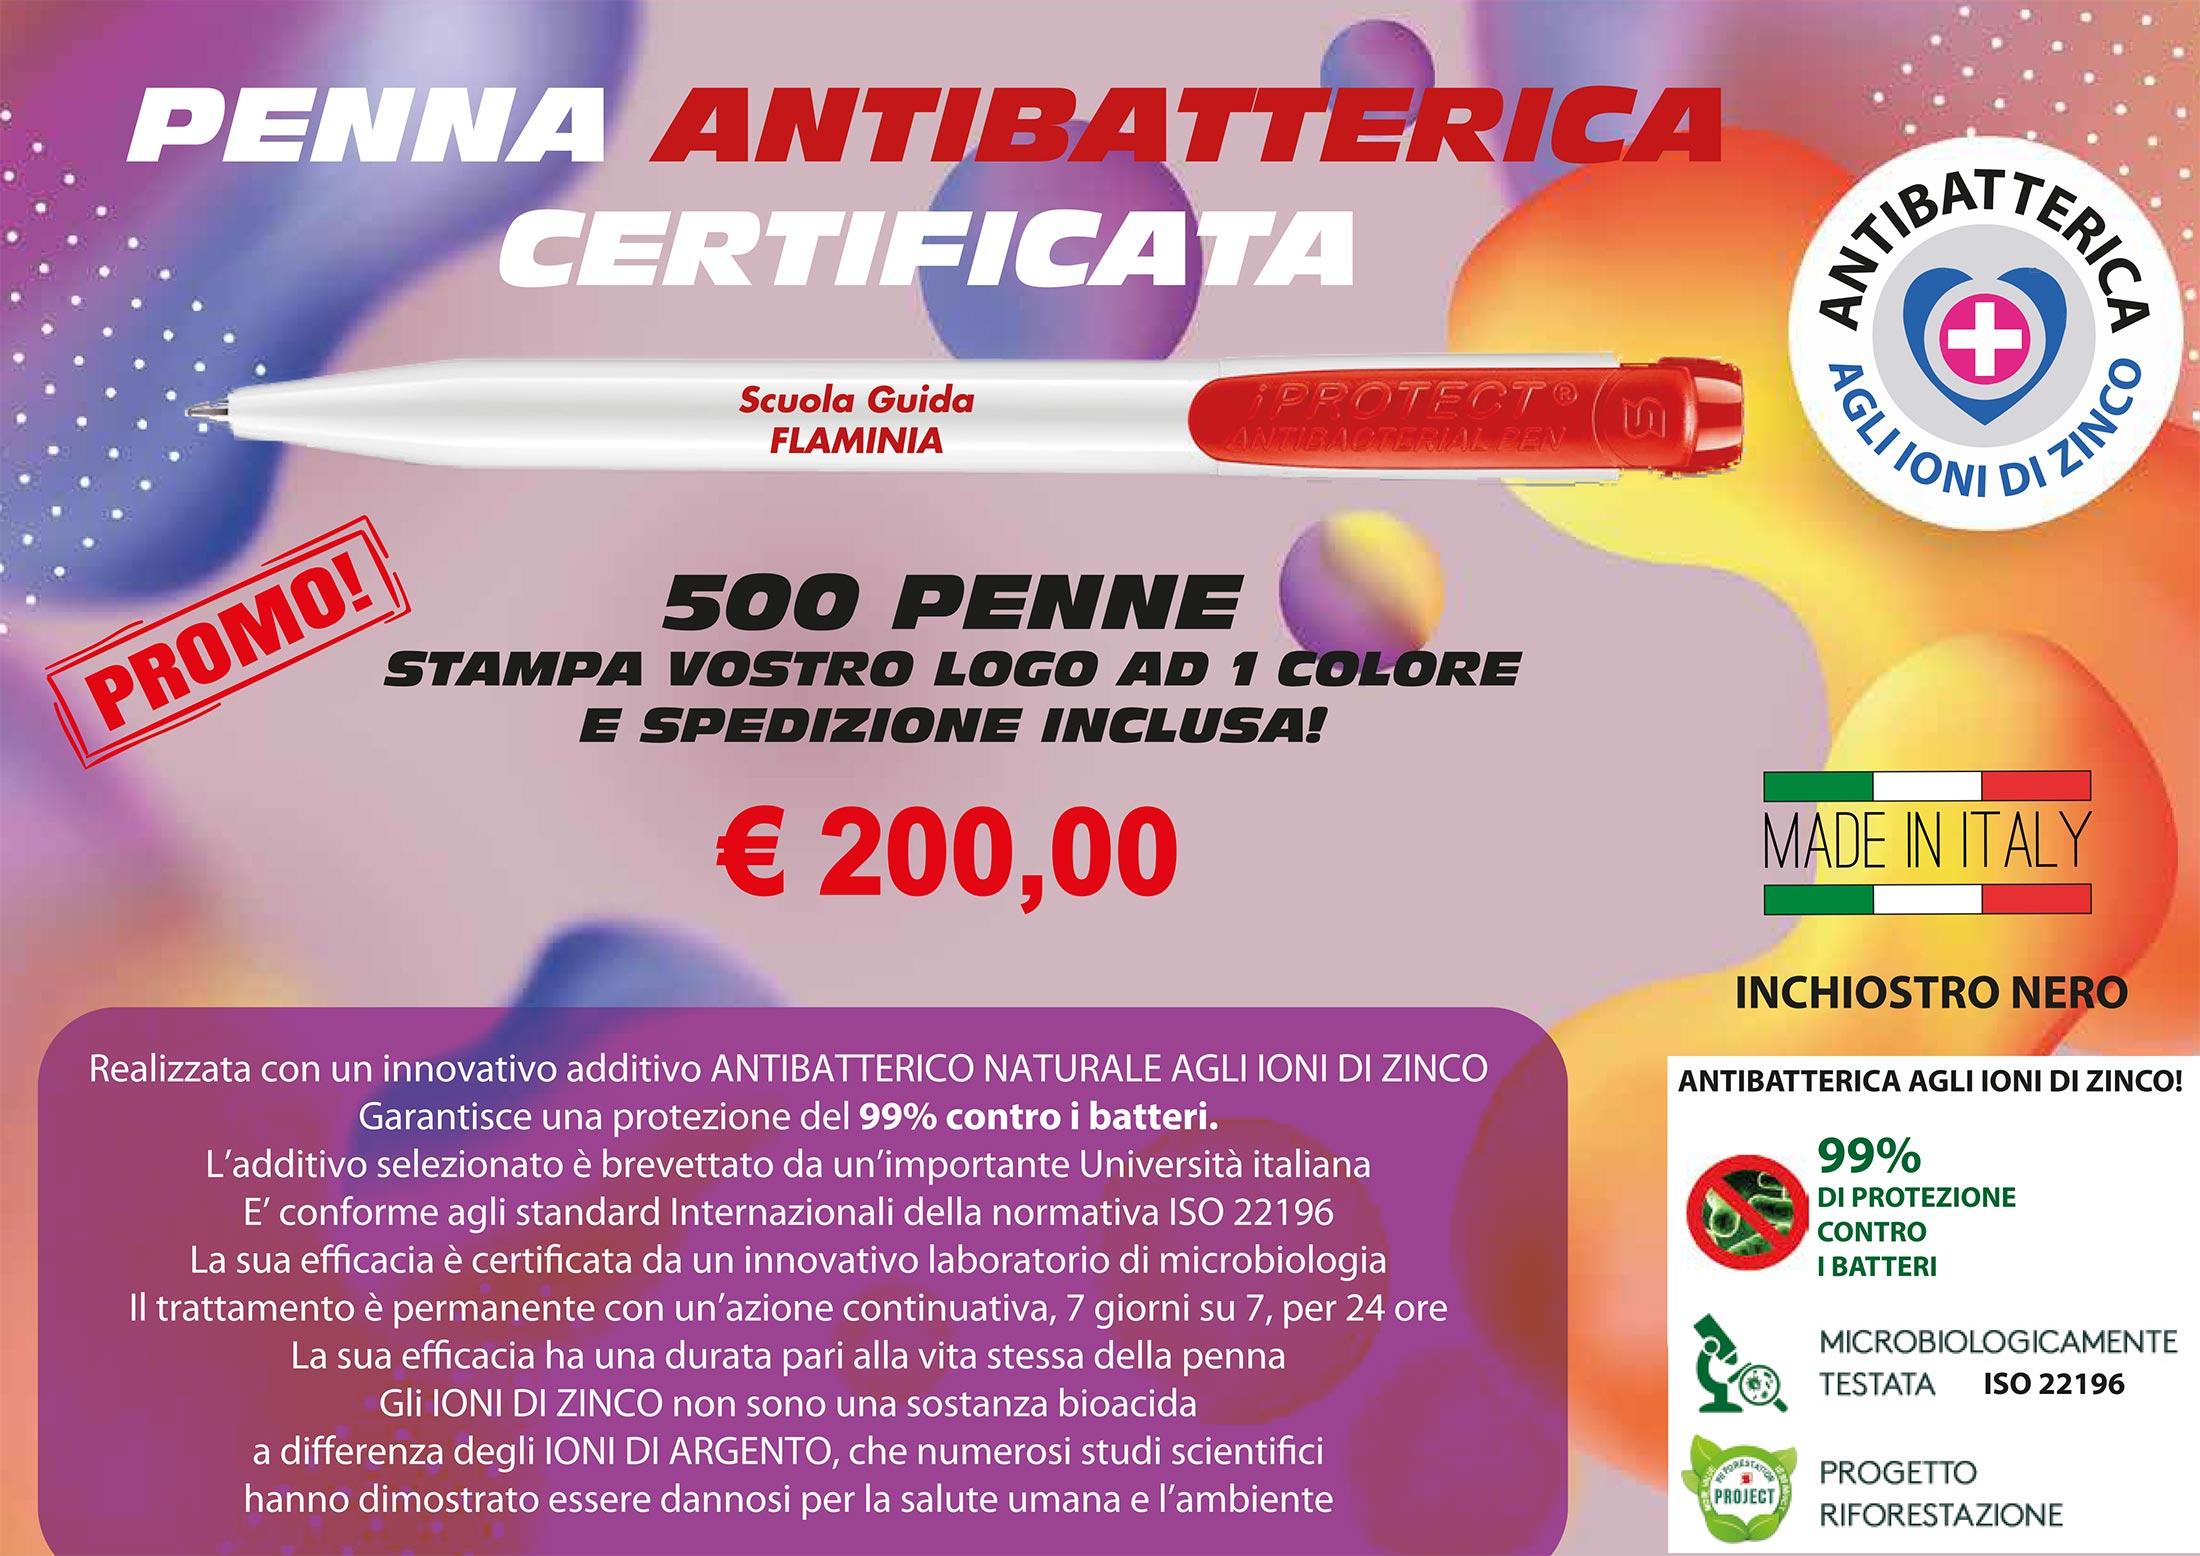 Penna antibatterica certificata